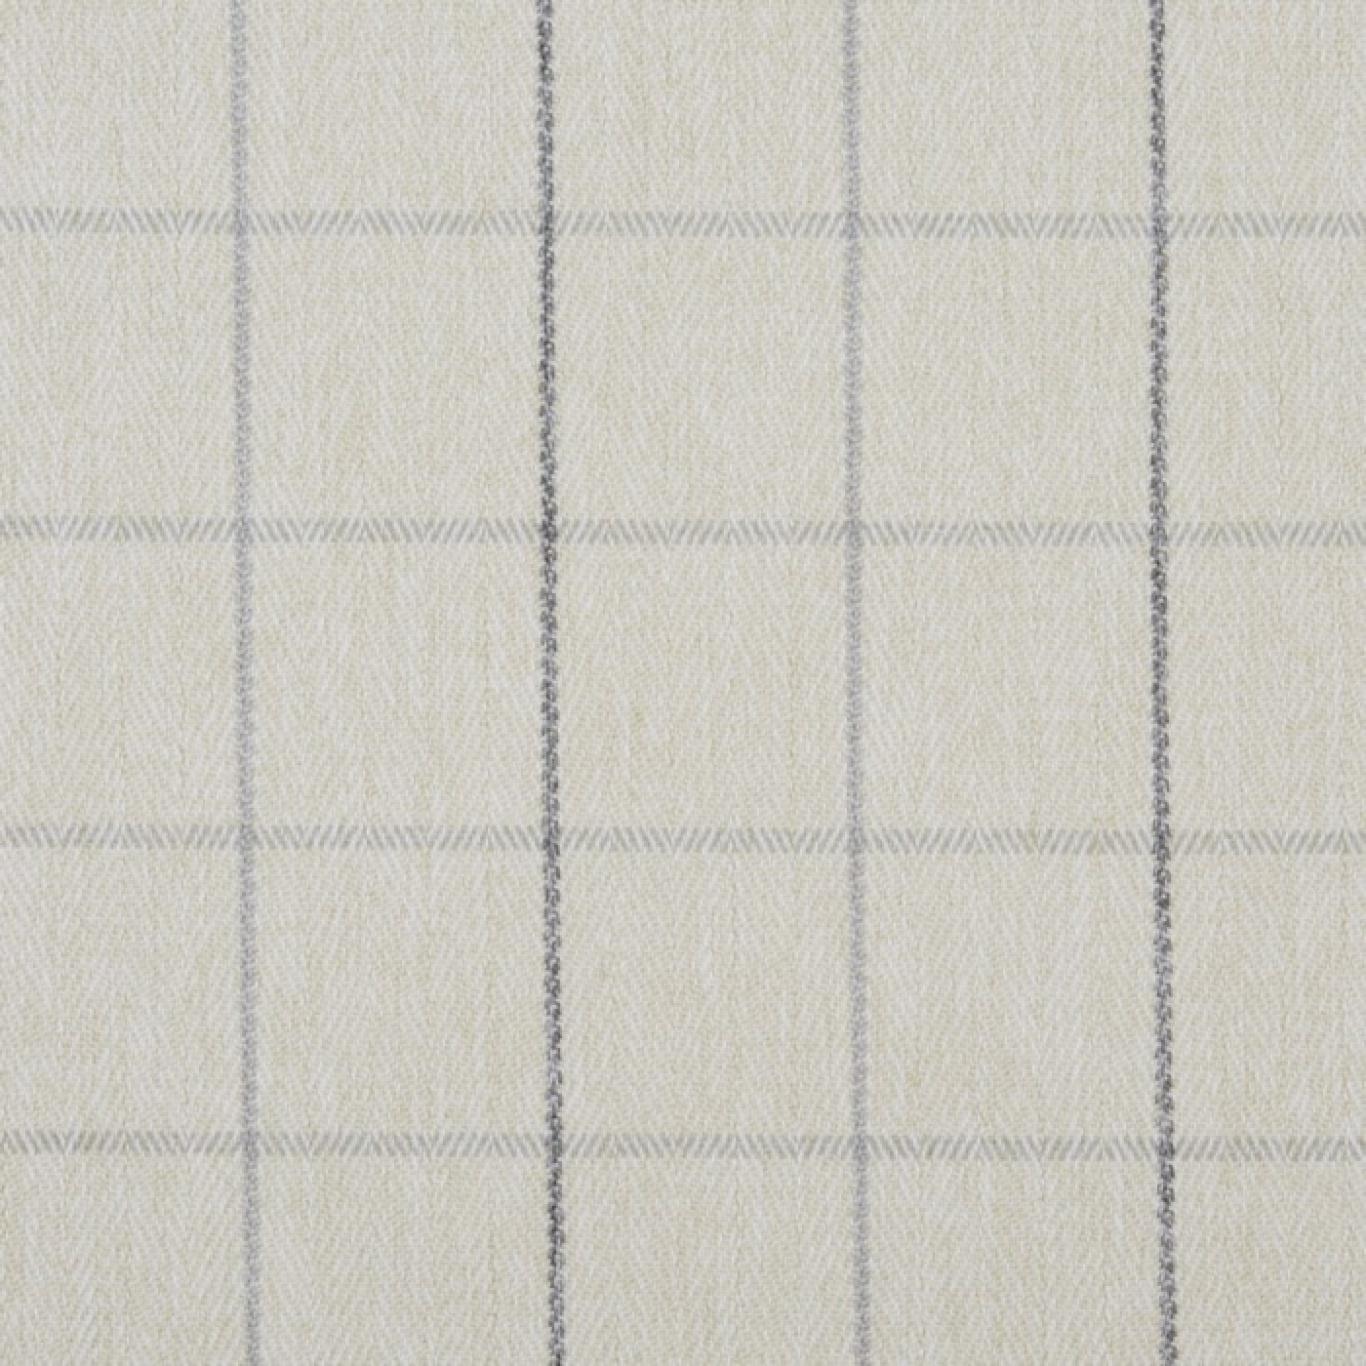 Image of Prestigious Brodie Pebble Fabric